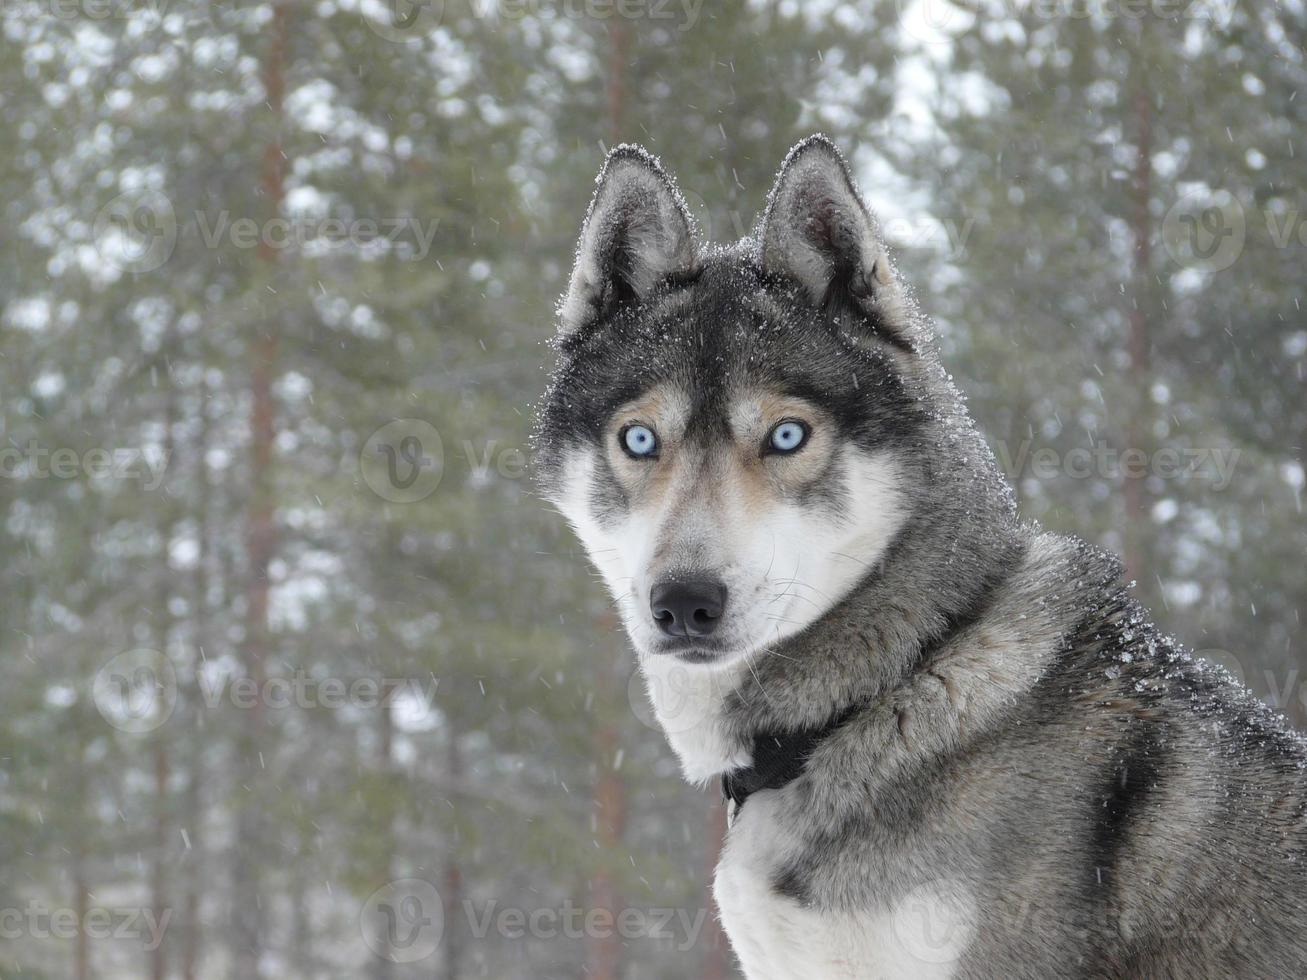 olhos azuis cão husky foto